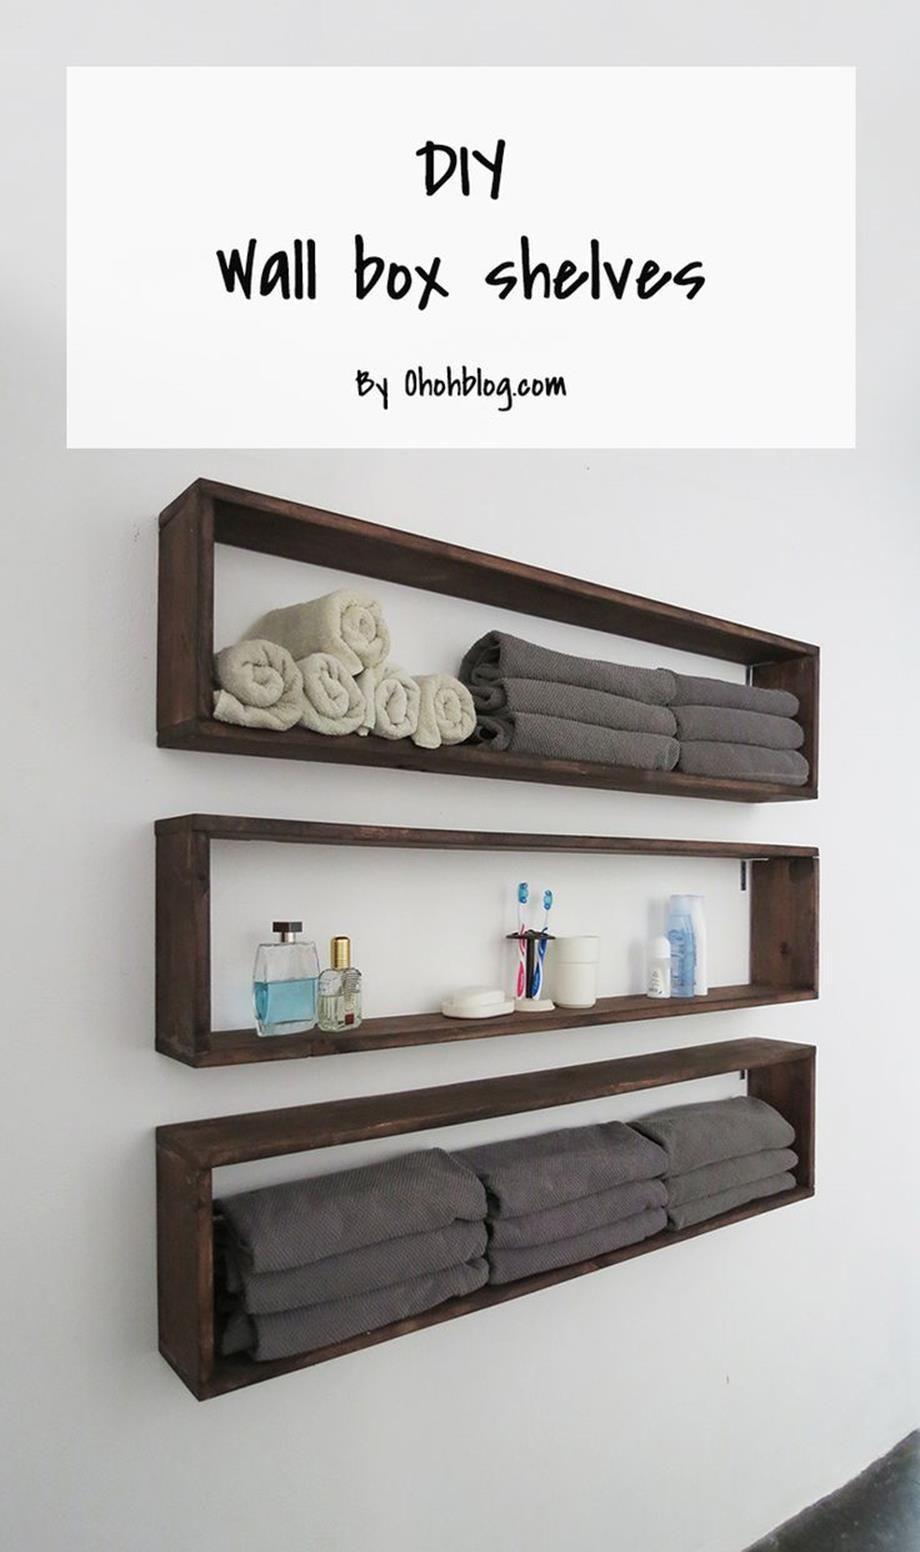 Wall Bookshelves 2   Idei de încercat   Pinterest